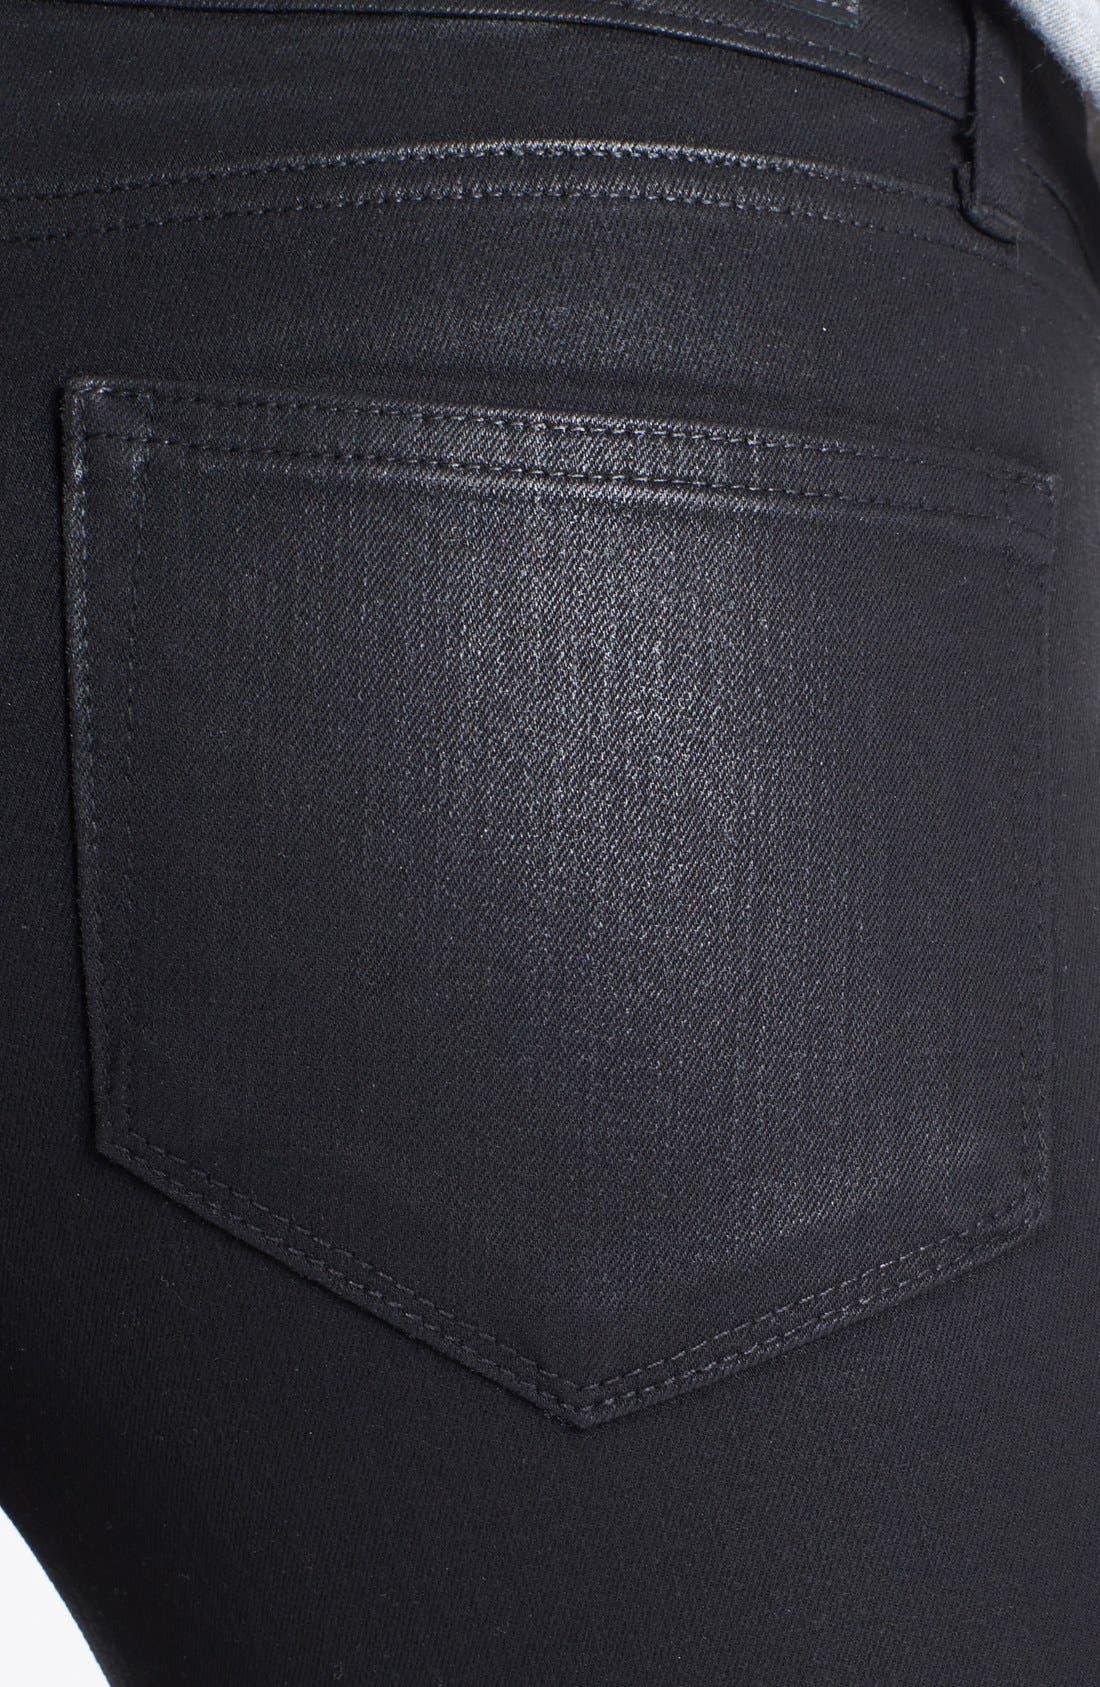 Denim 'Verdugo' Ankle Coated Skinny Jeans,                             Alternate thumbnail 3, color,                             001